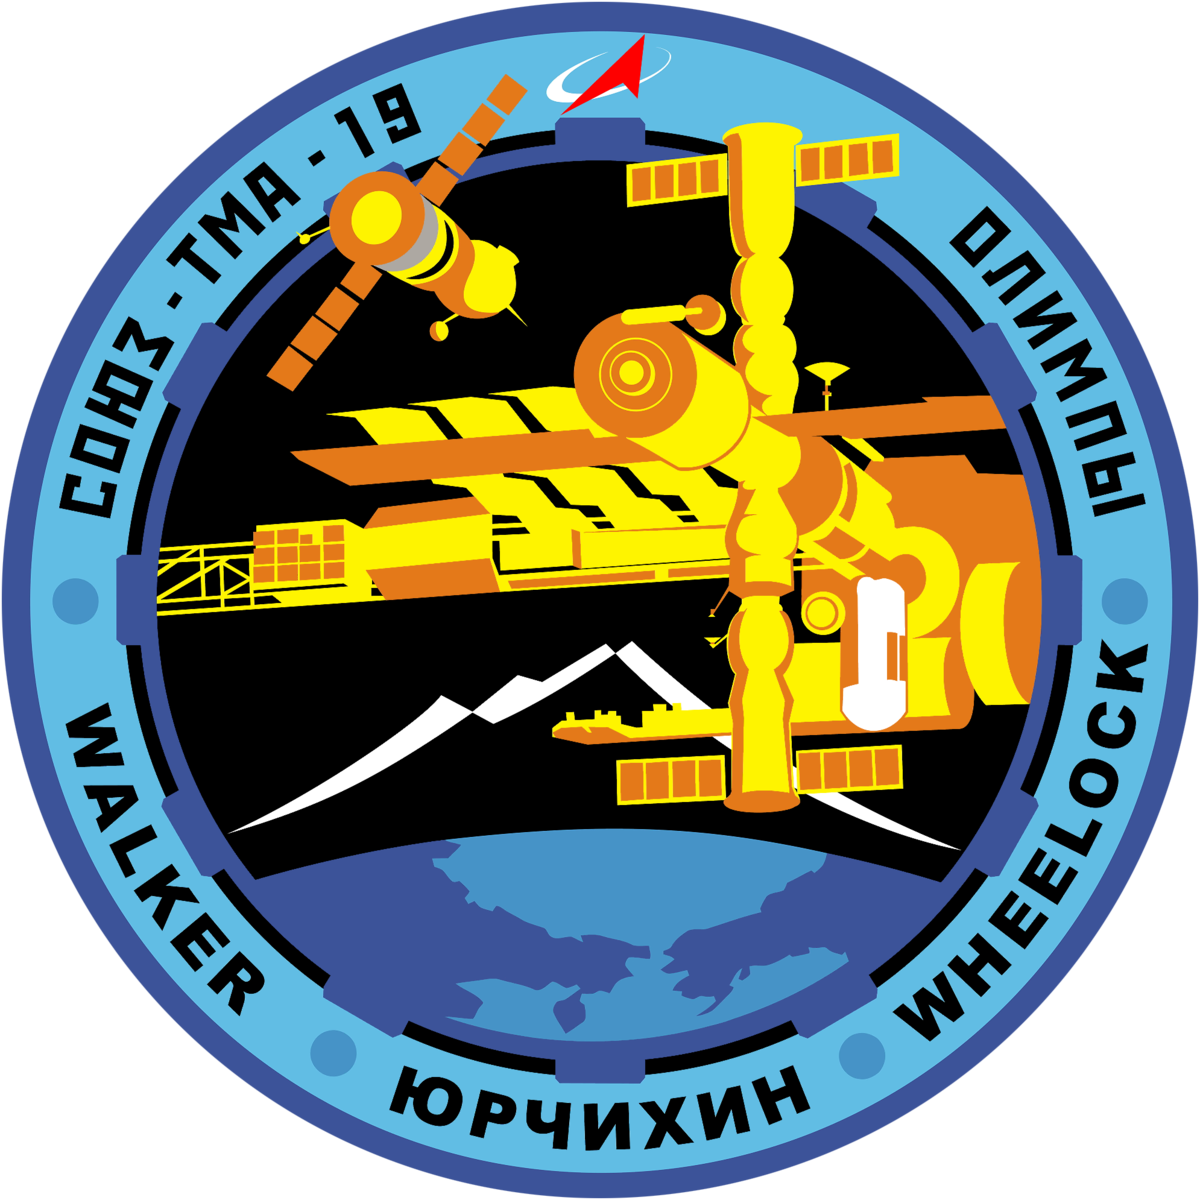 Missions clipart space flight. Soyuz tma wikipedia